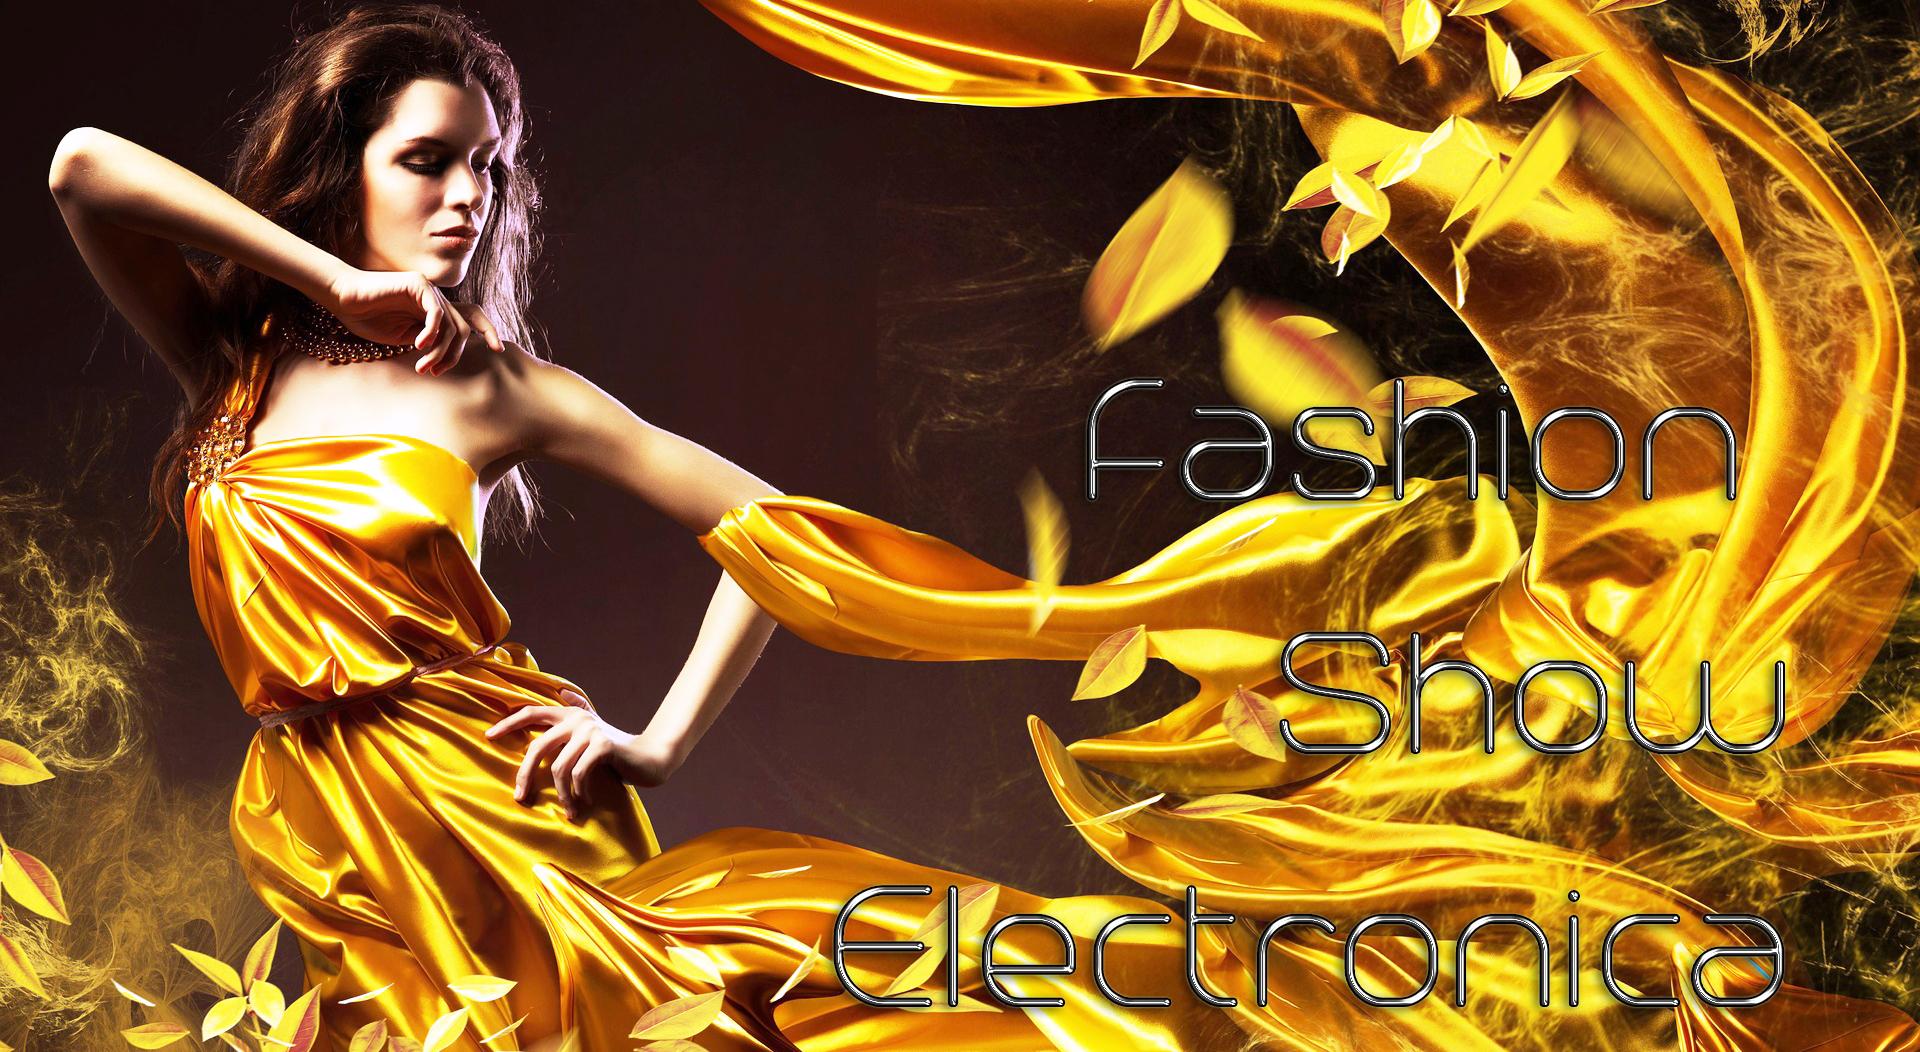 Fashion Show Electronica